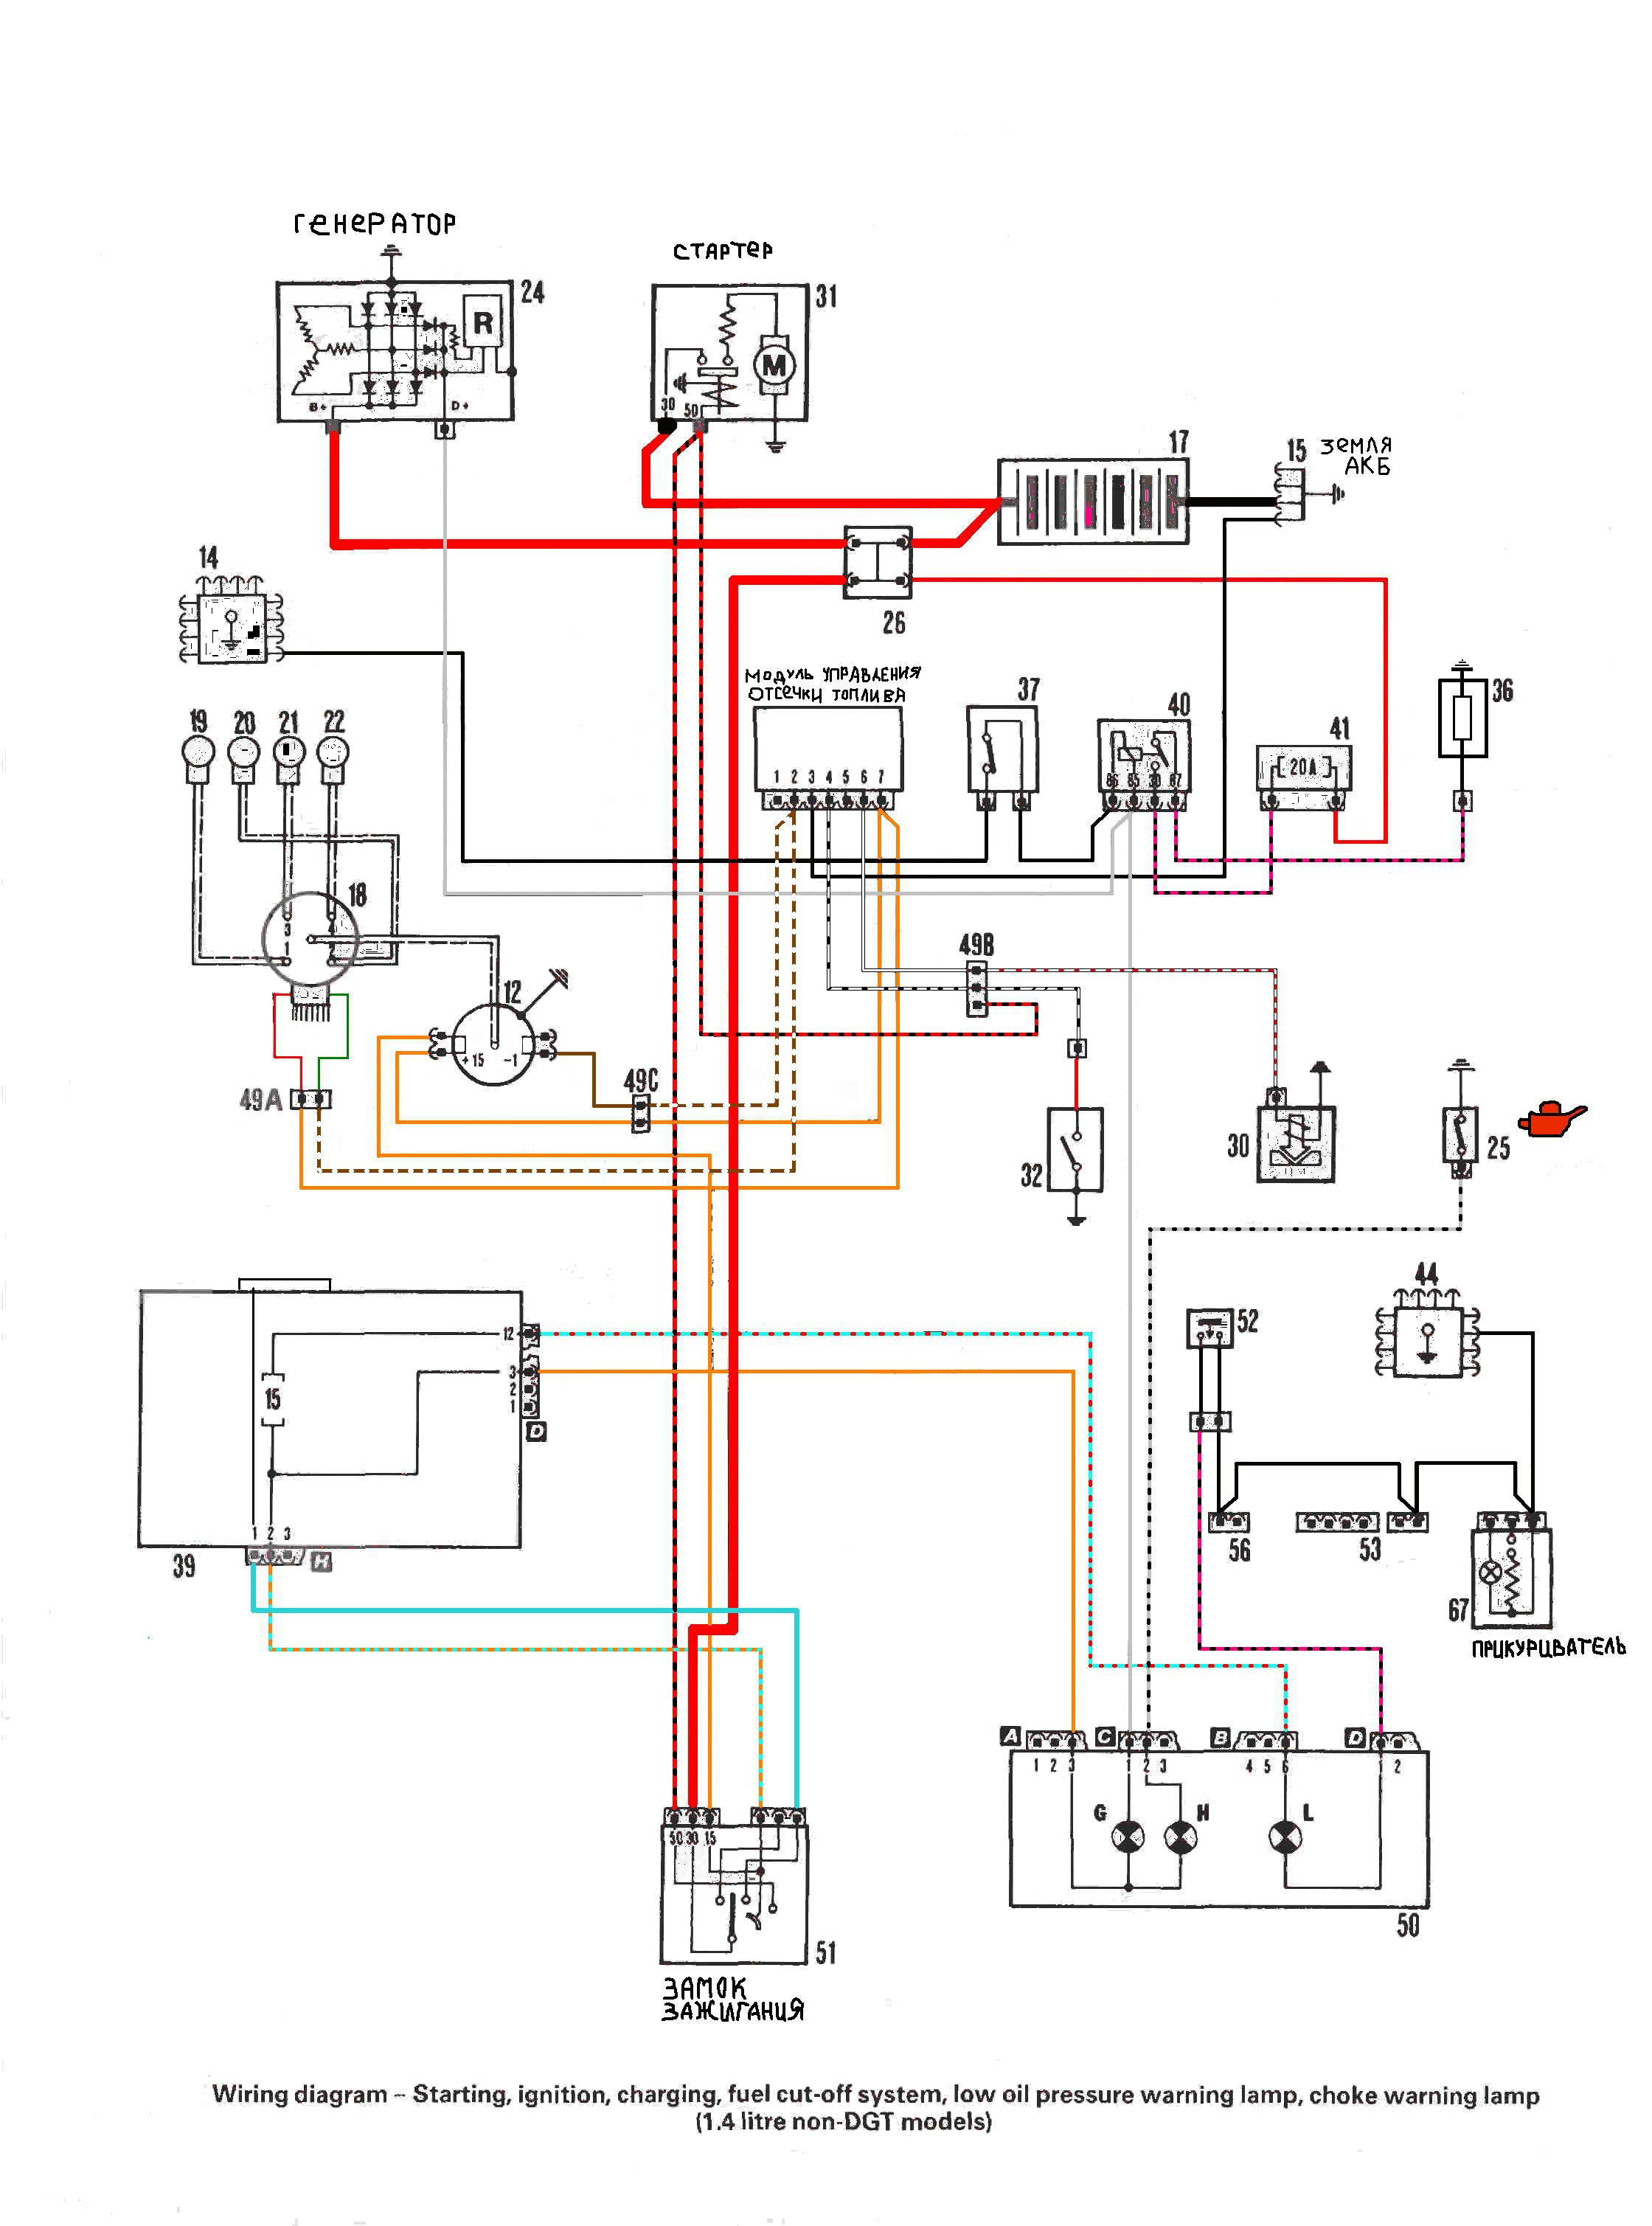 Fiat tipo схема электрооборудования